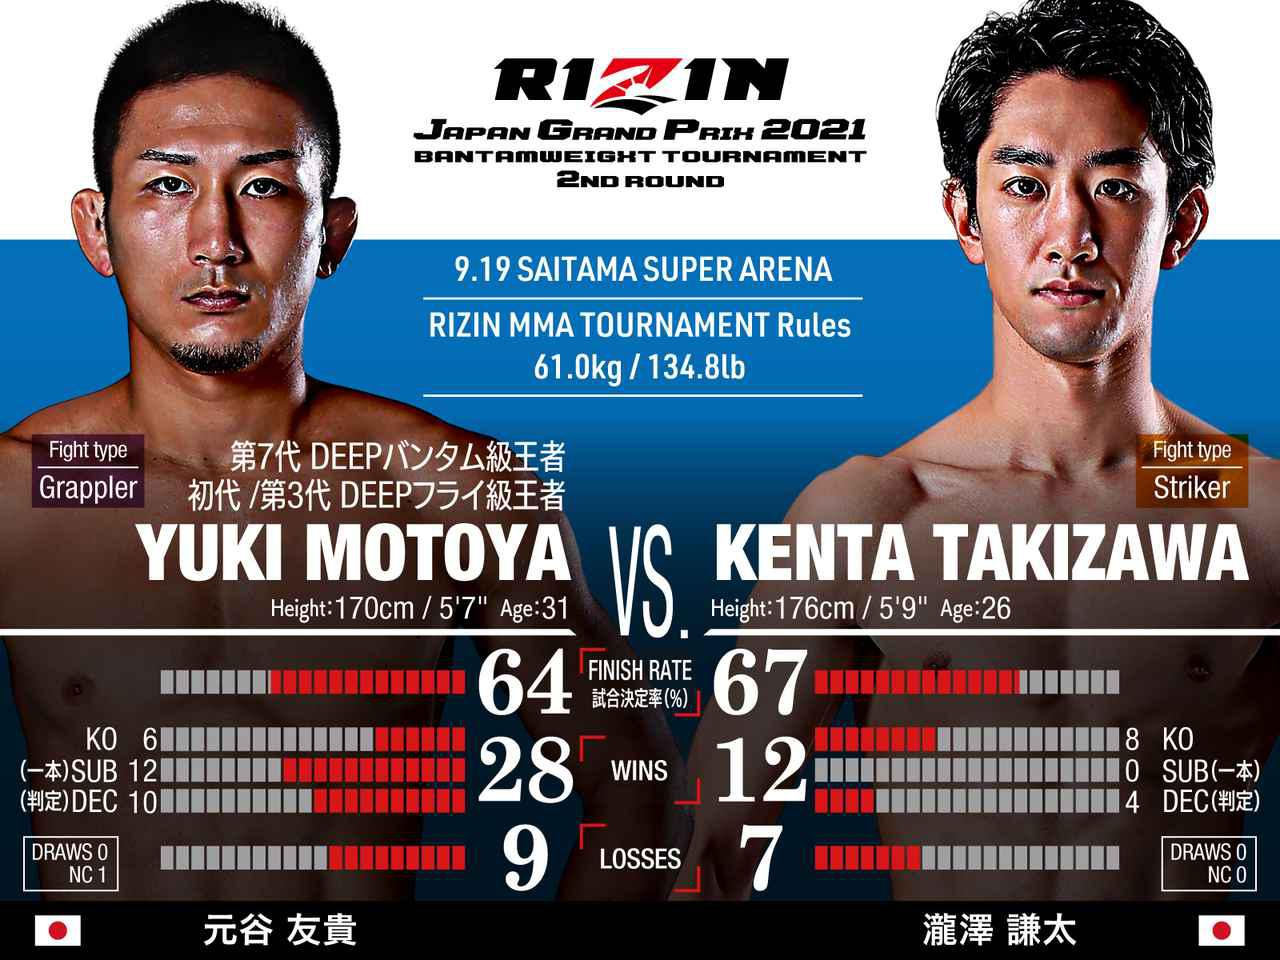 画像: Yuki Motoya vs Kenta Takizawa